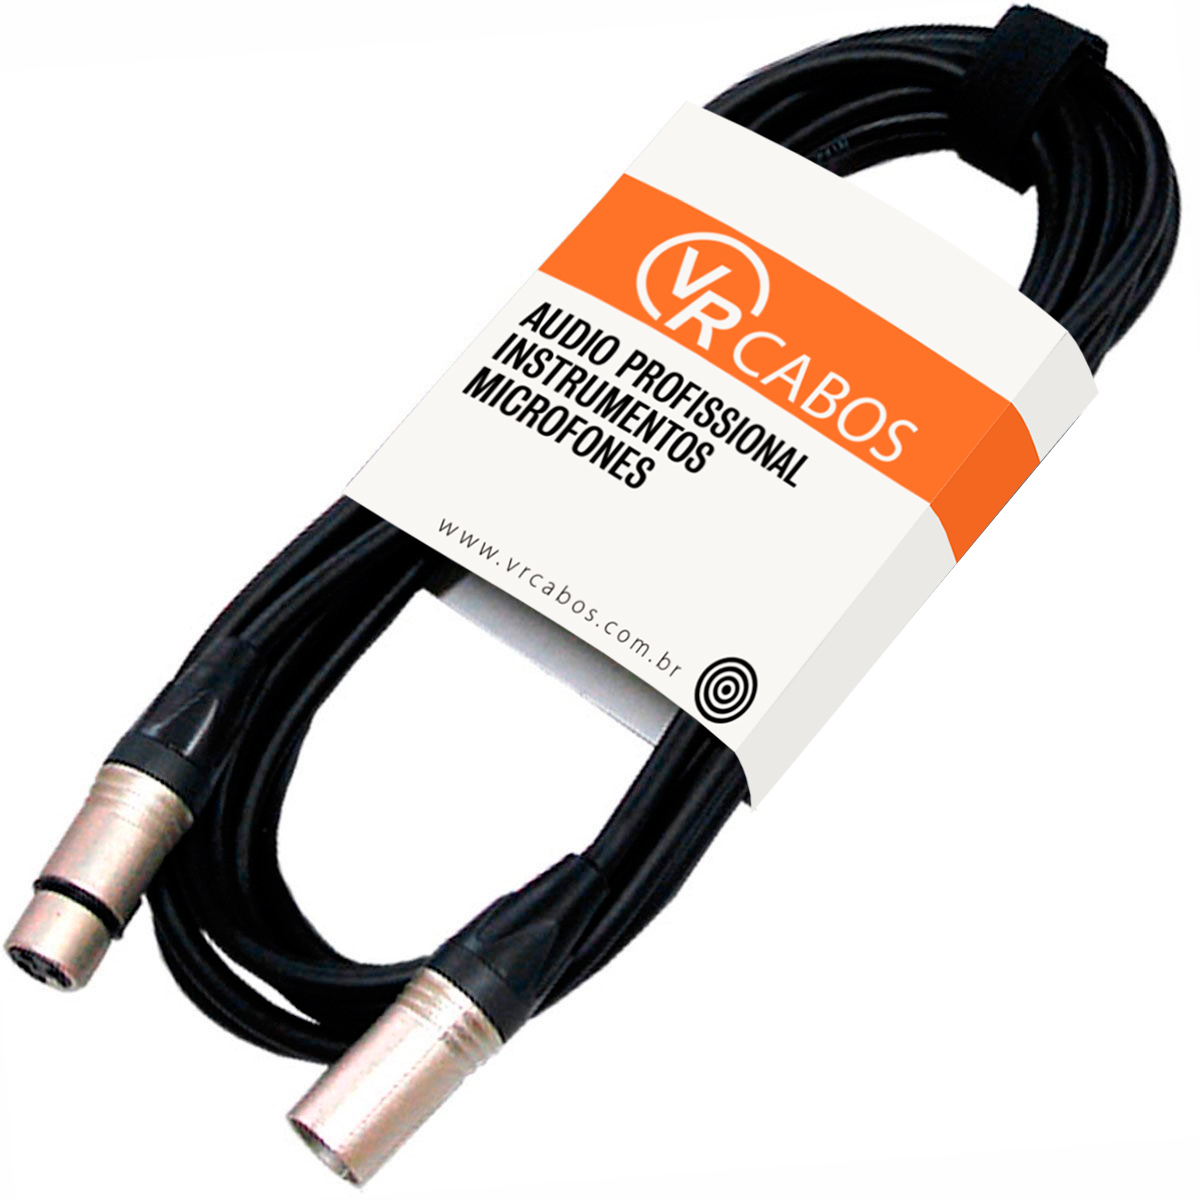 Cabo Emborrachado p/ Microfone 03Mt XLR M / XLR F Balanceado - VR CABOS